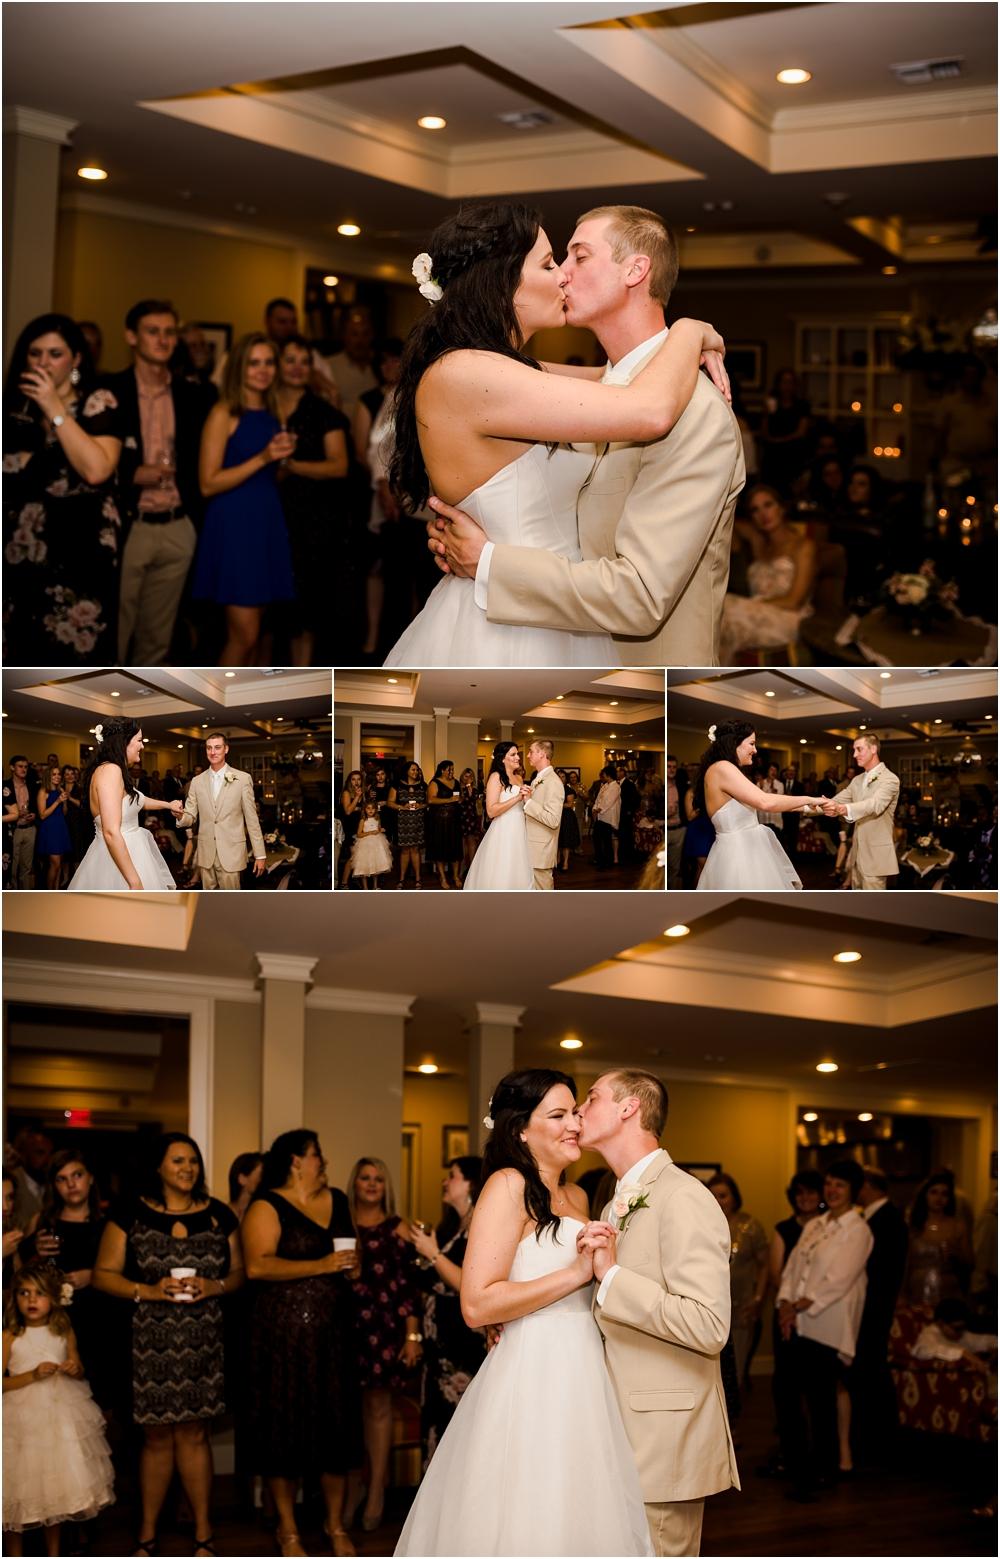 pensacola-wedding-photographer-kiersten-grant-124.jpg